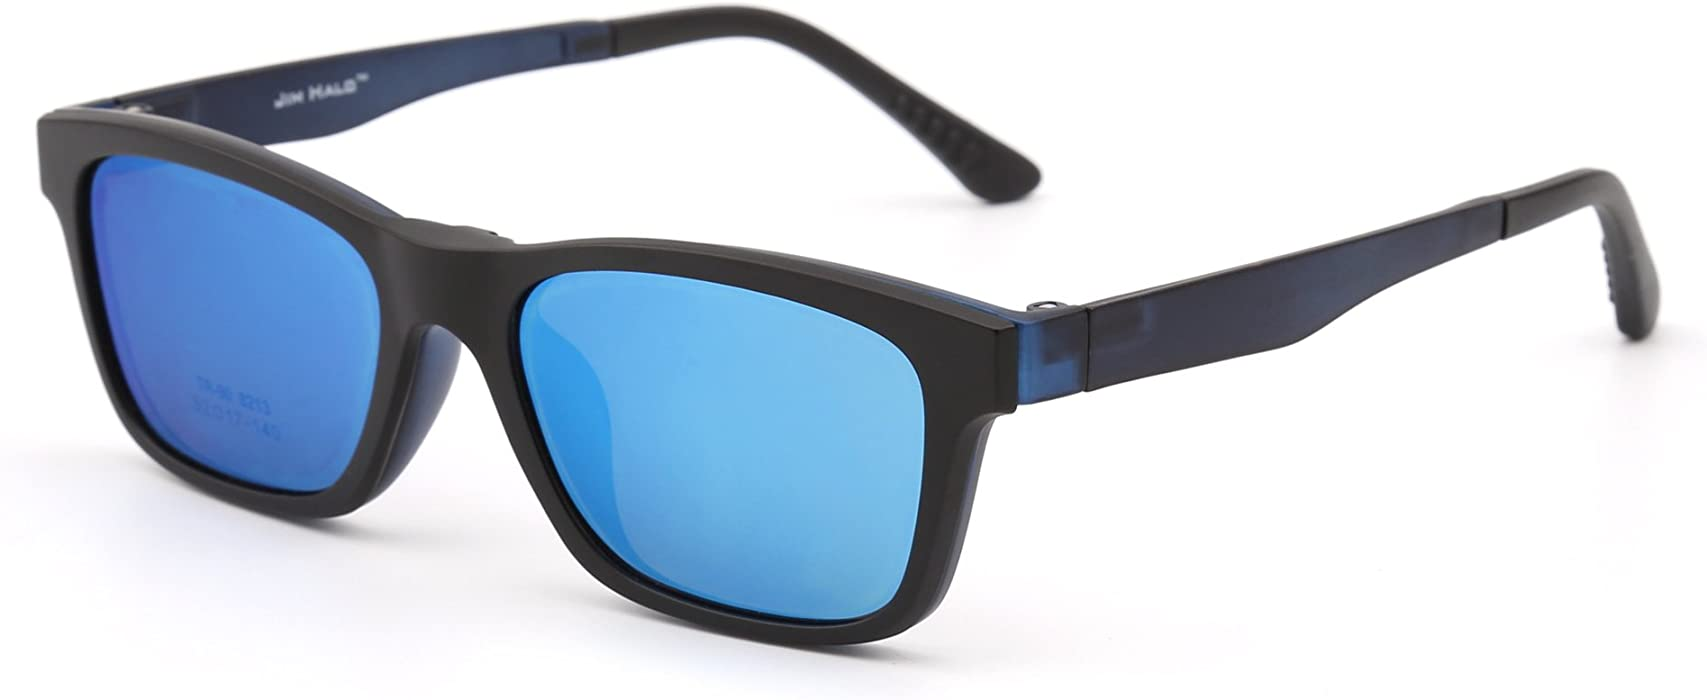 c36db9737d4 Retro Polarized Magnetic Sunglasses Clip on TR Eyeglasses Frame Men Women  (Matte Black Mirror Blue)  Amazon.co.uk  Clothing